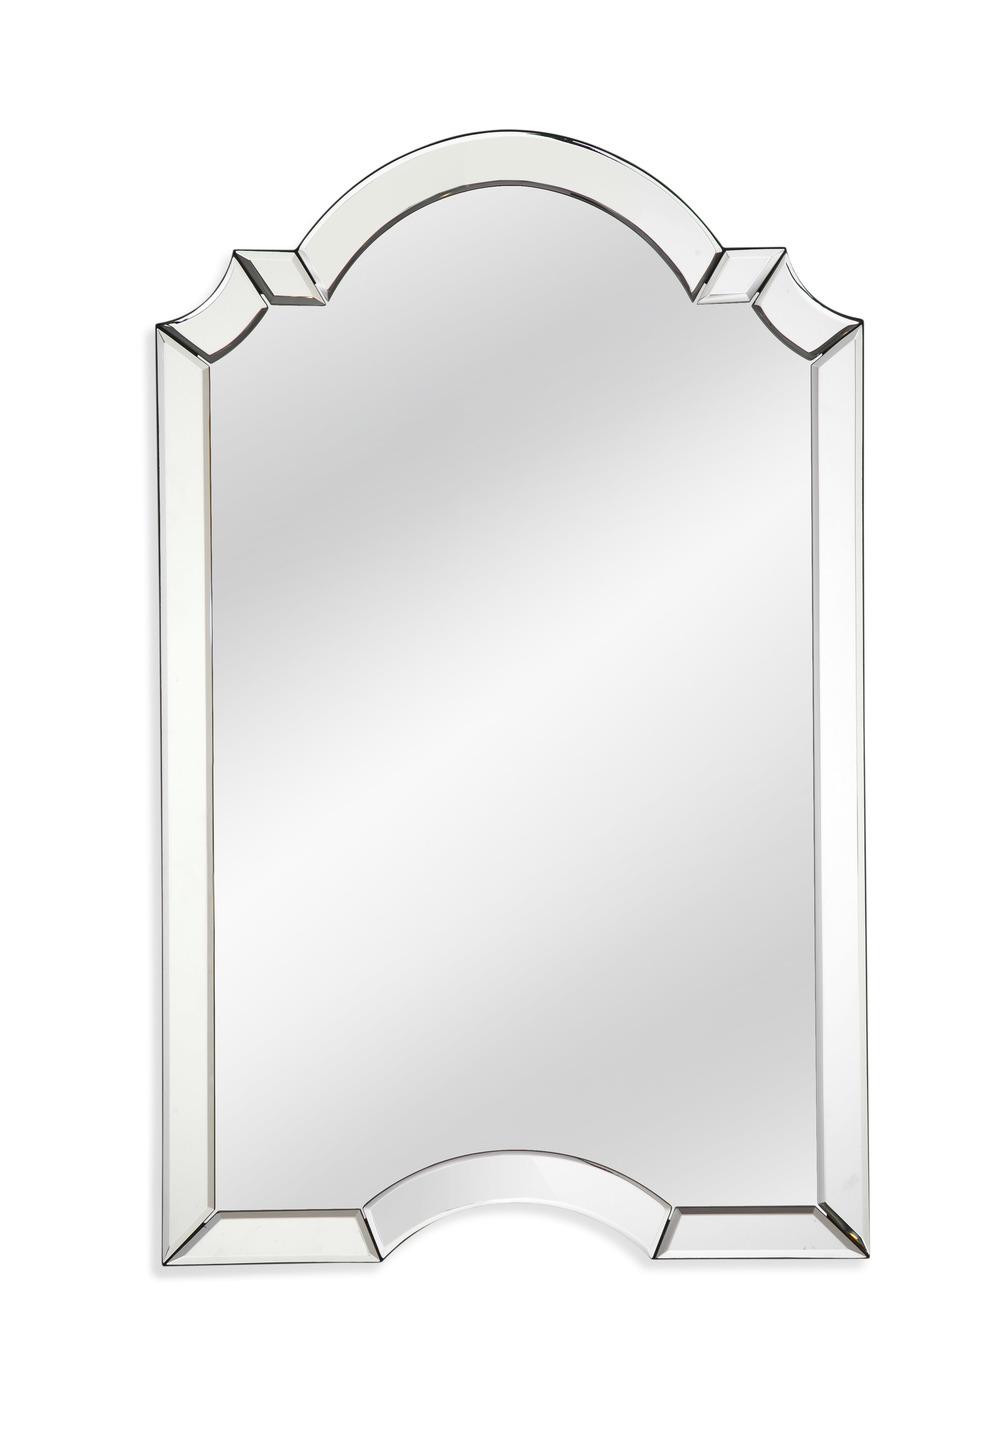 Bassett Mirror Company - Emerson Wall Mirror